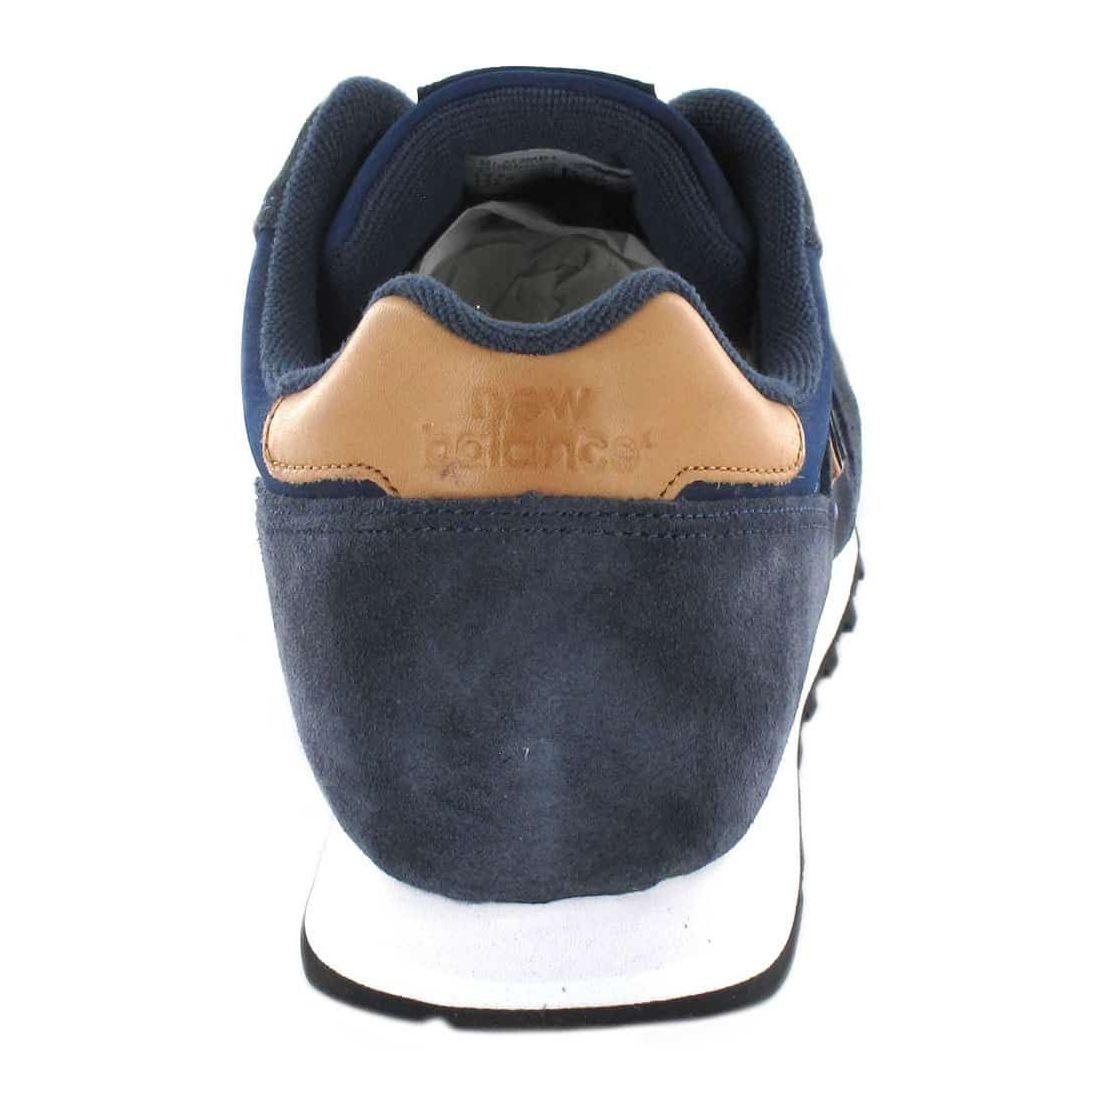 New Balance ML373MRT New Balance Calzado Casual Hombre Lifestyle Tallas: 41,5, 42, 42,5, 43, 44, 44,5, 45,5, 46,5;